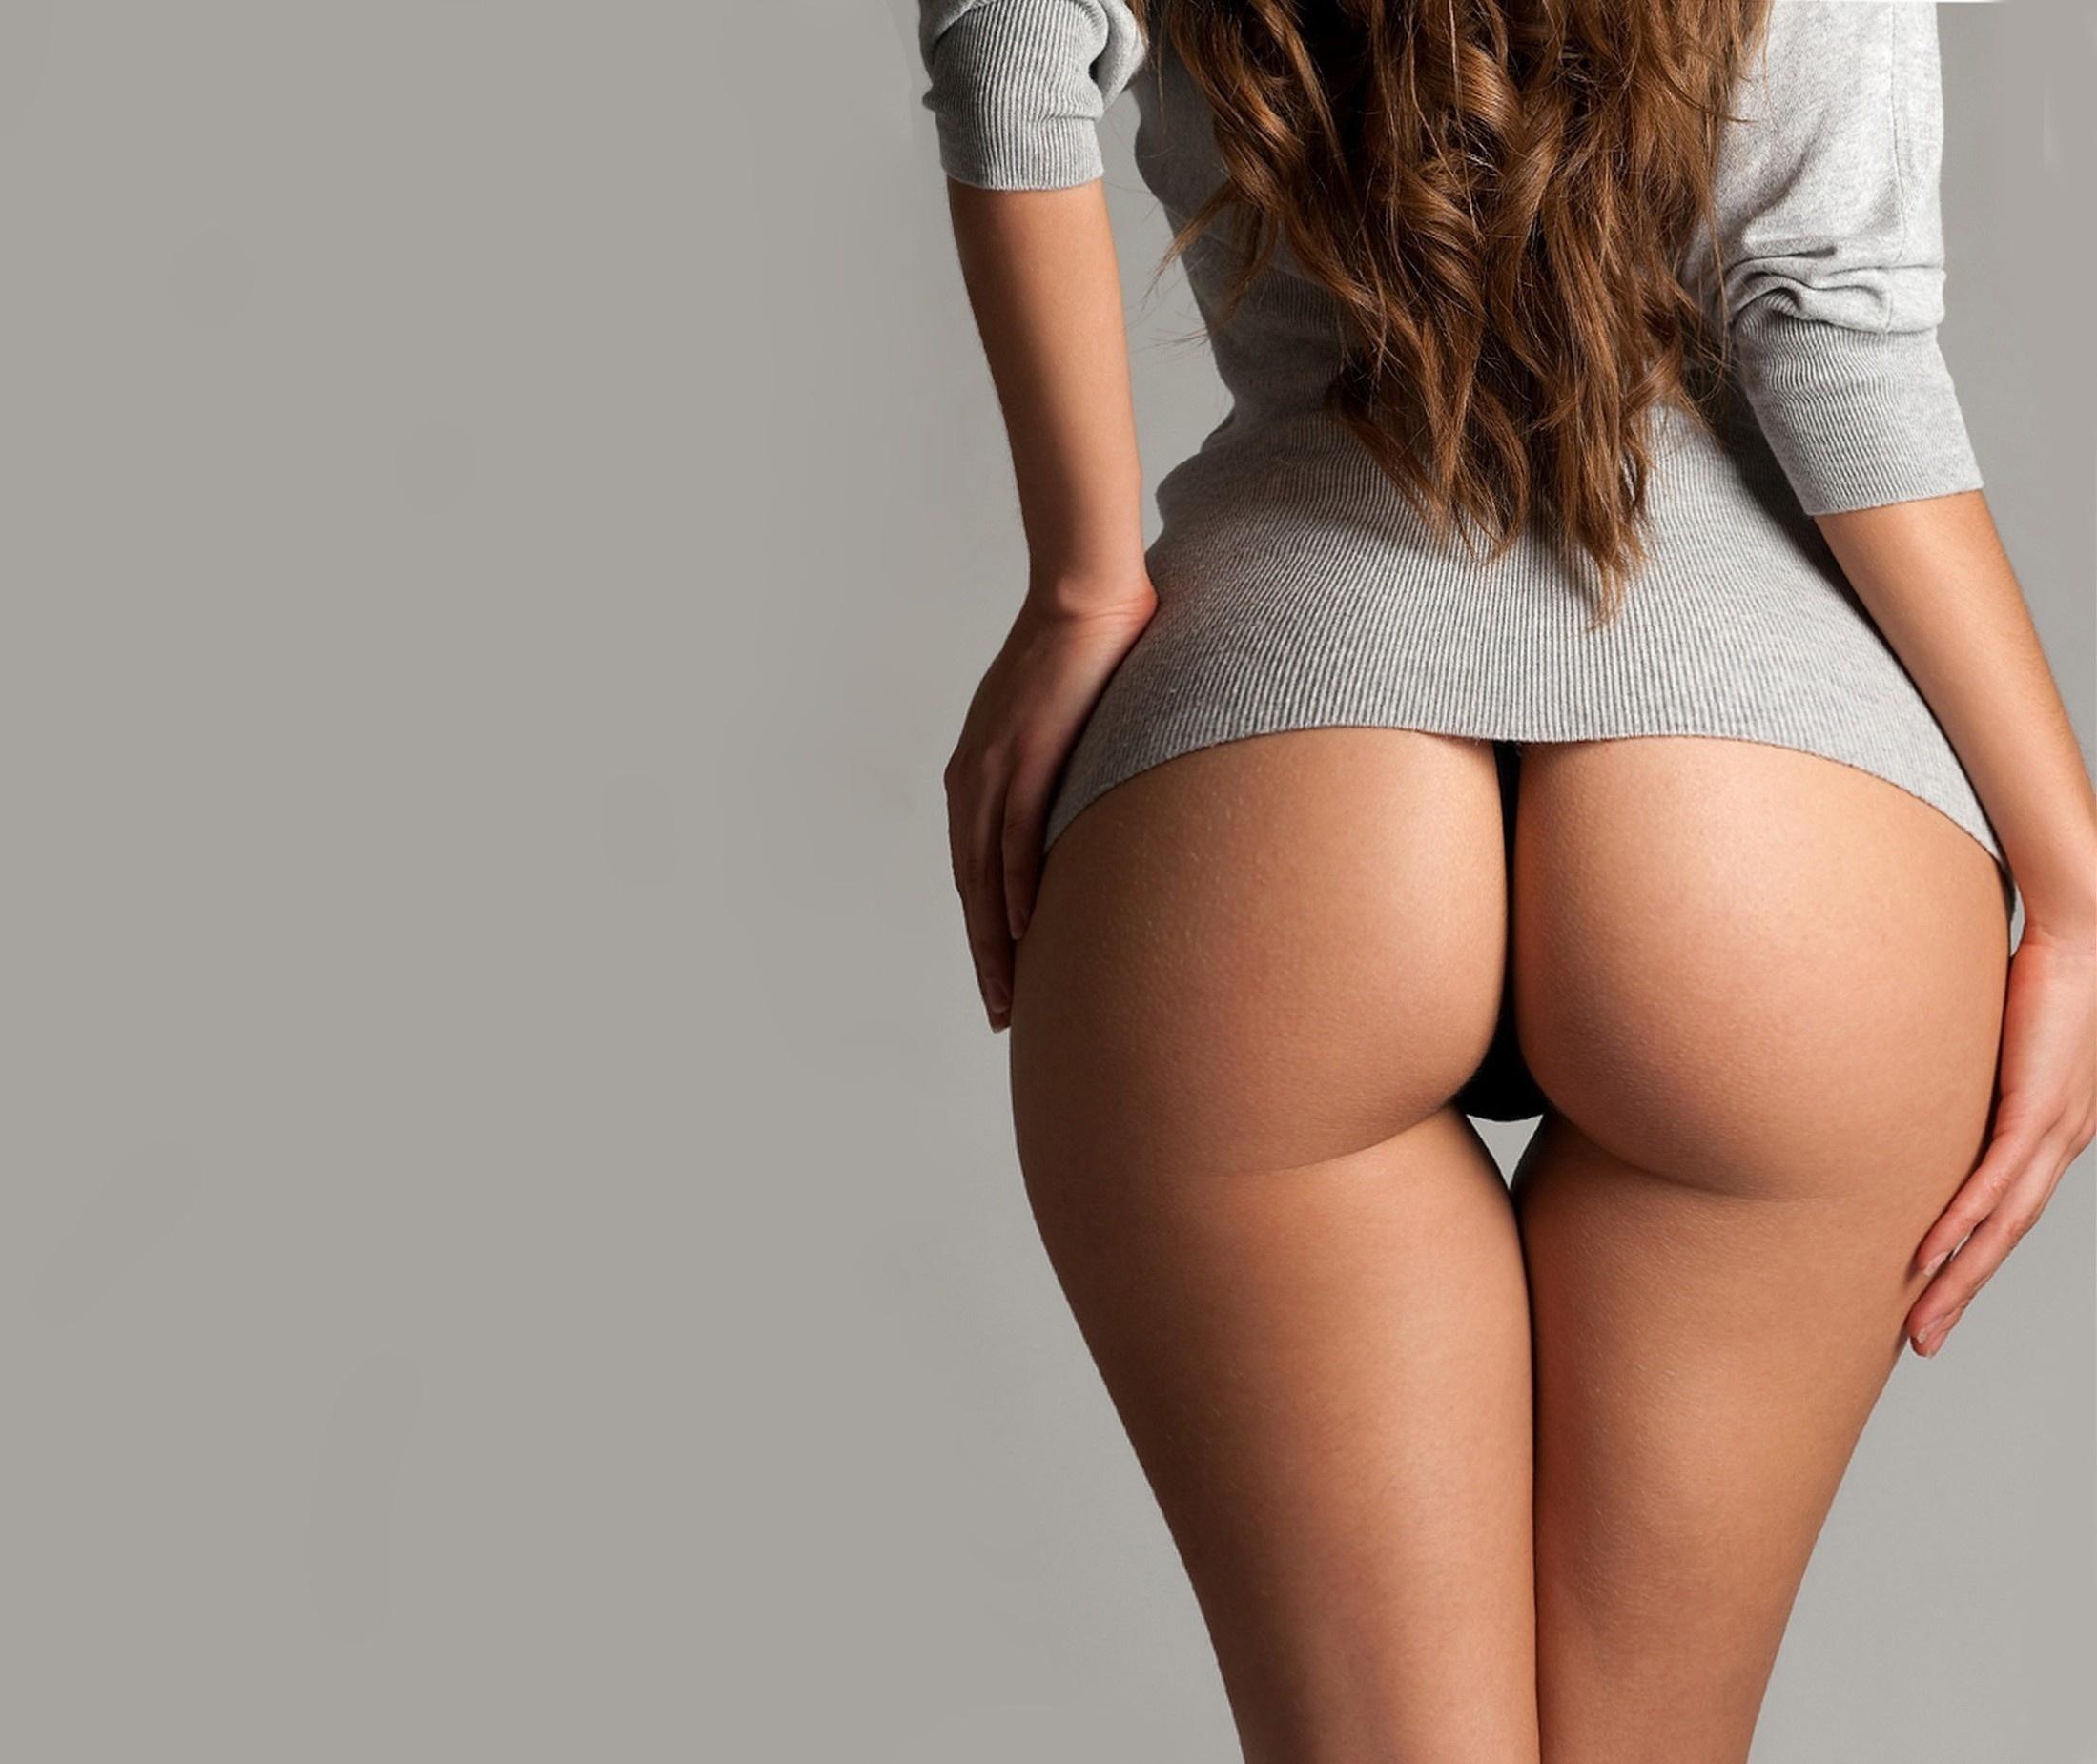 Download 2199x1850 lingerie, girl, beautiful, back, ass ...